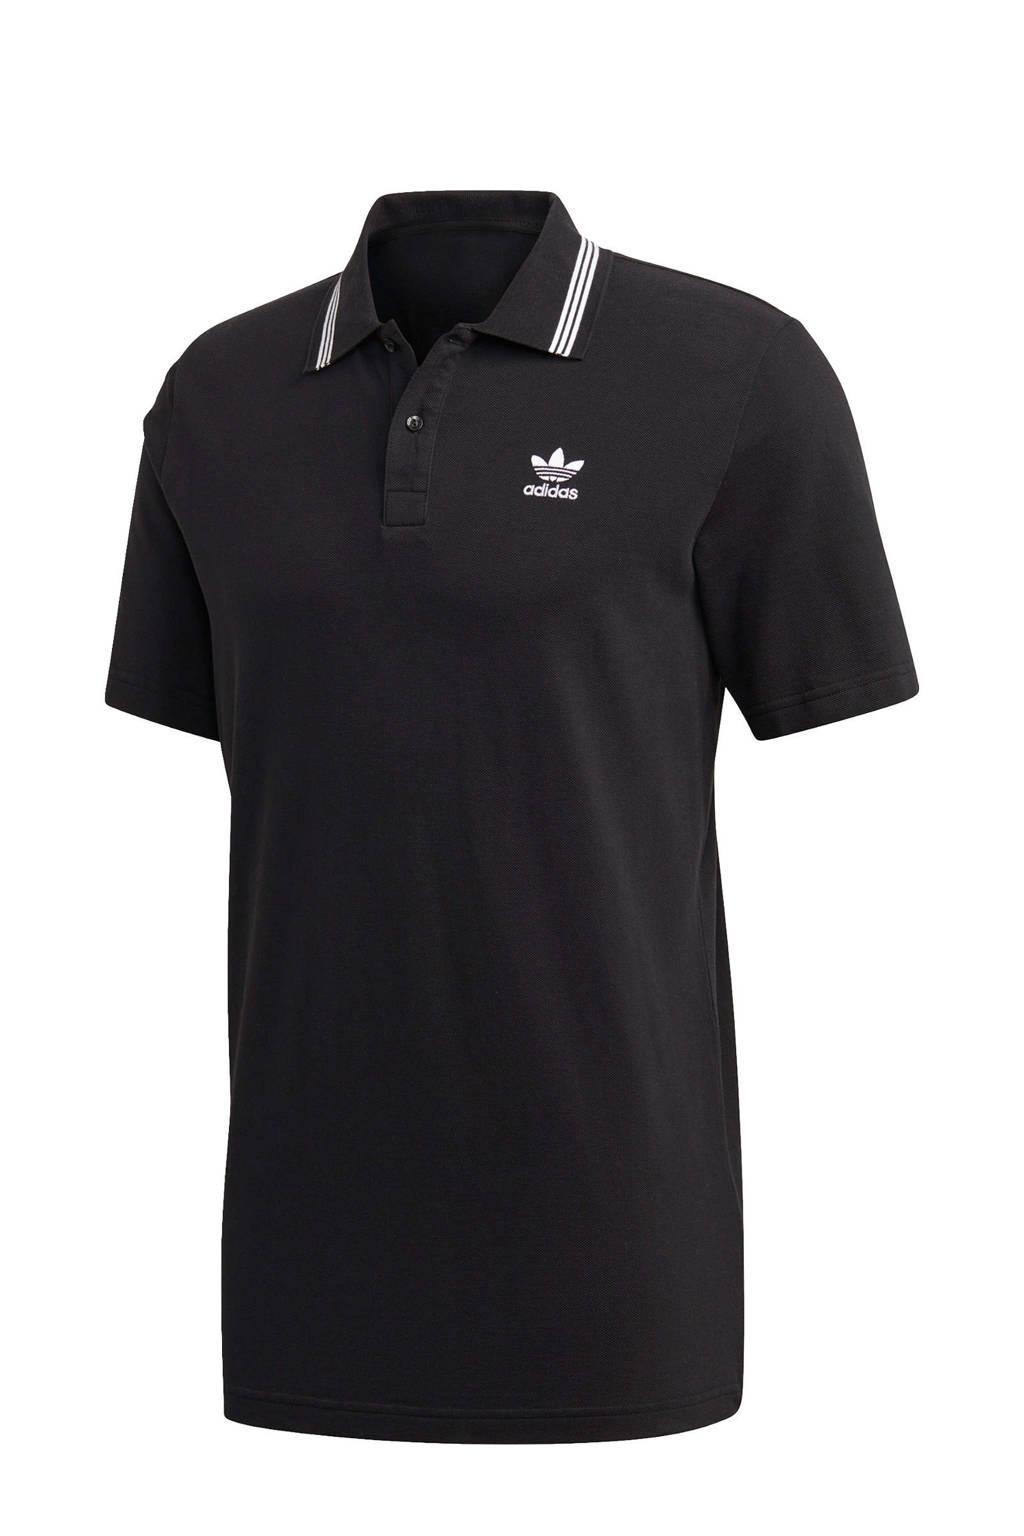 adidas Originals   Adicolor polo zwart/wit, Zwart/wit